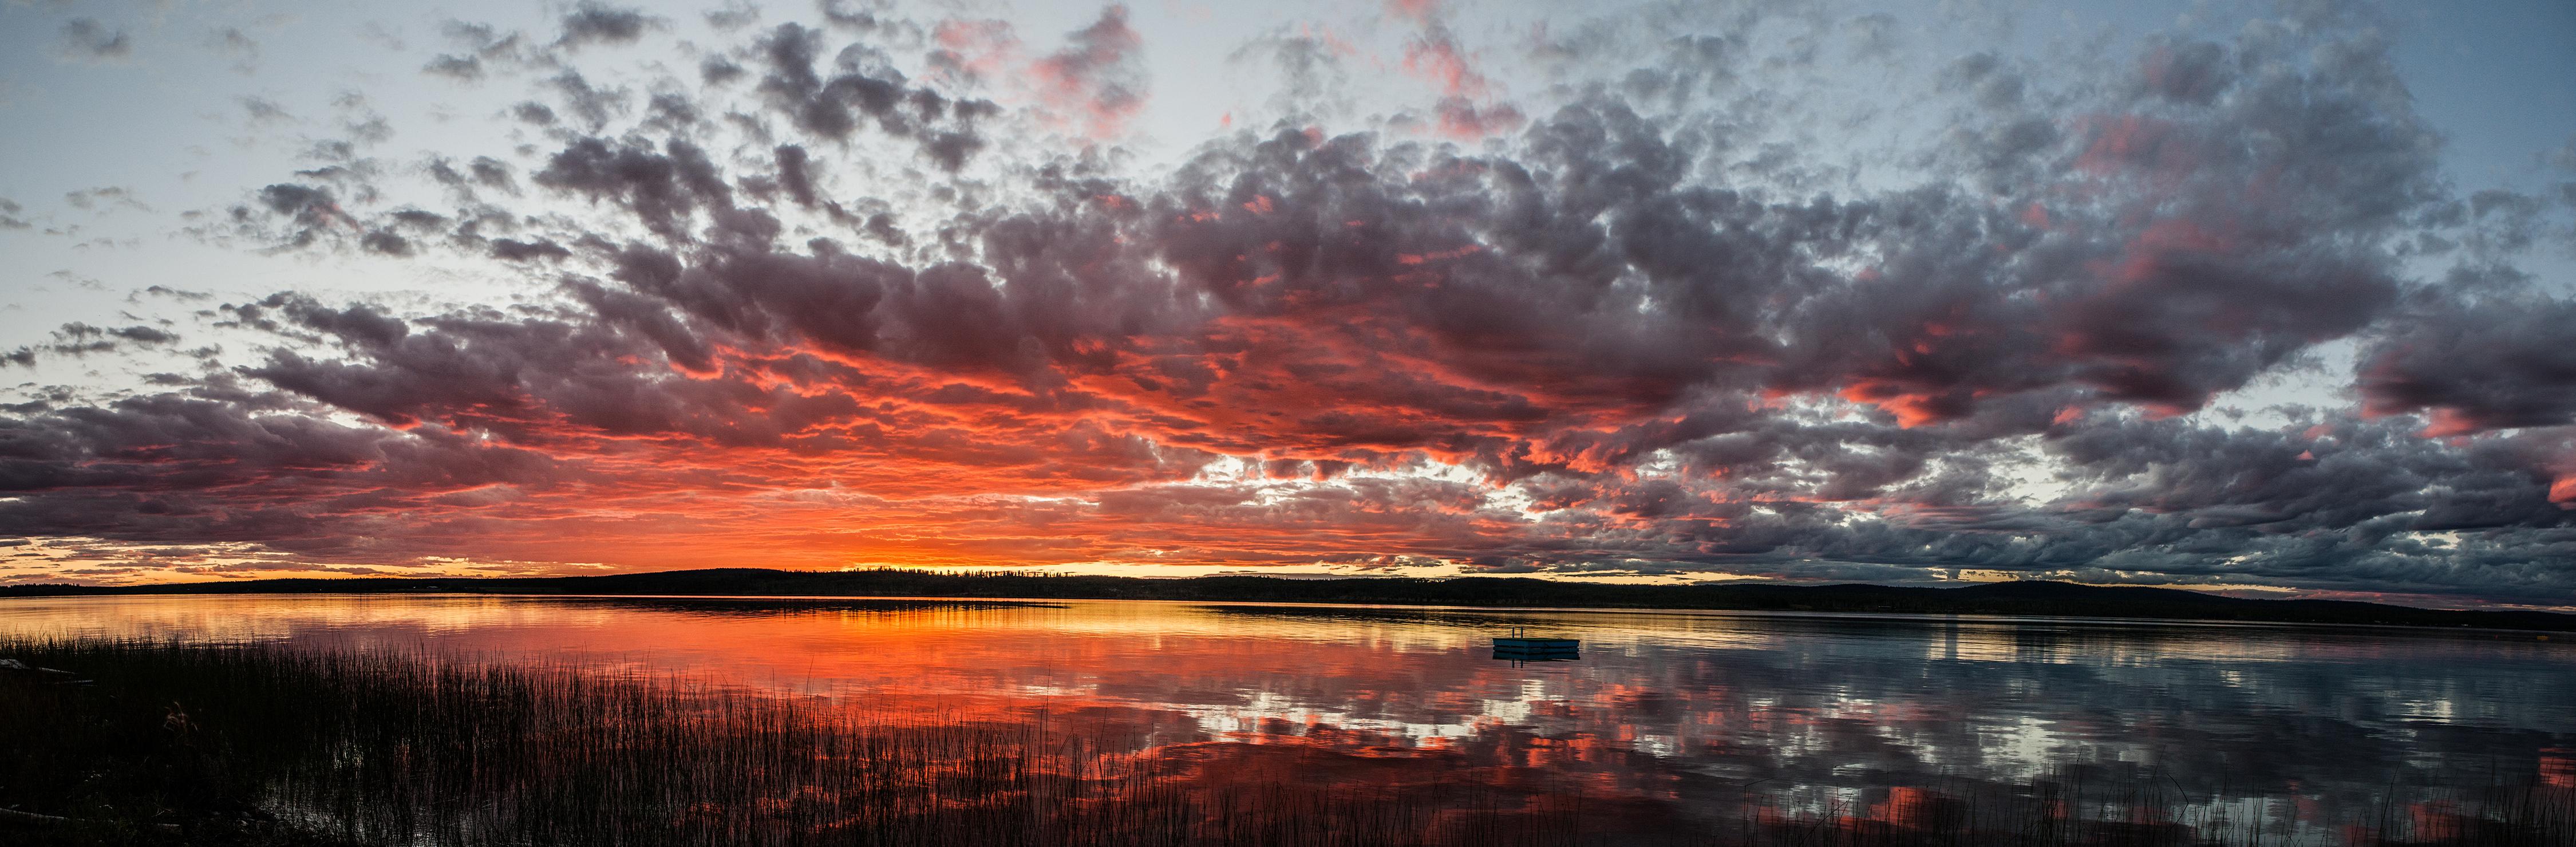 Green Lake, British Columbia. Summer sunset panorama. [OC][OS][4500x1479]